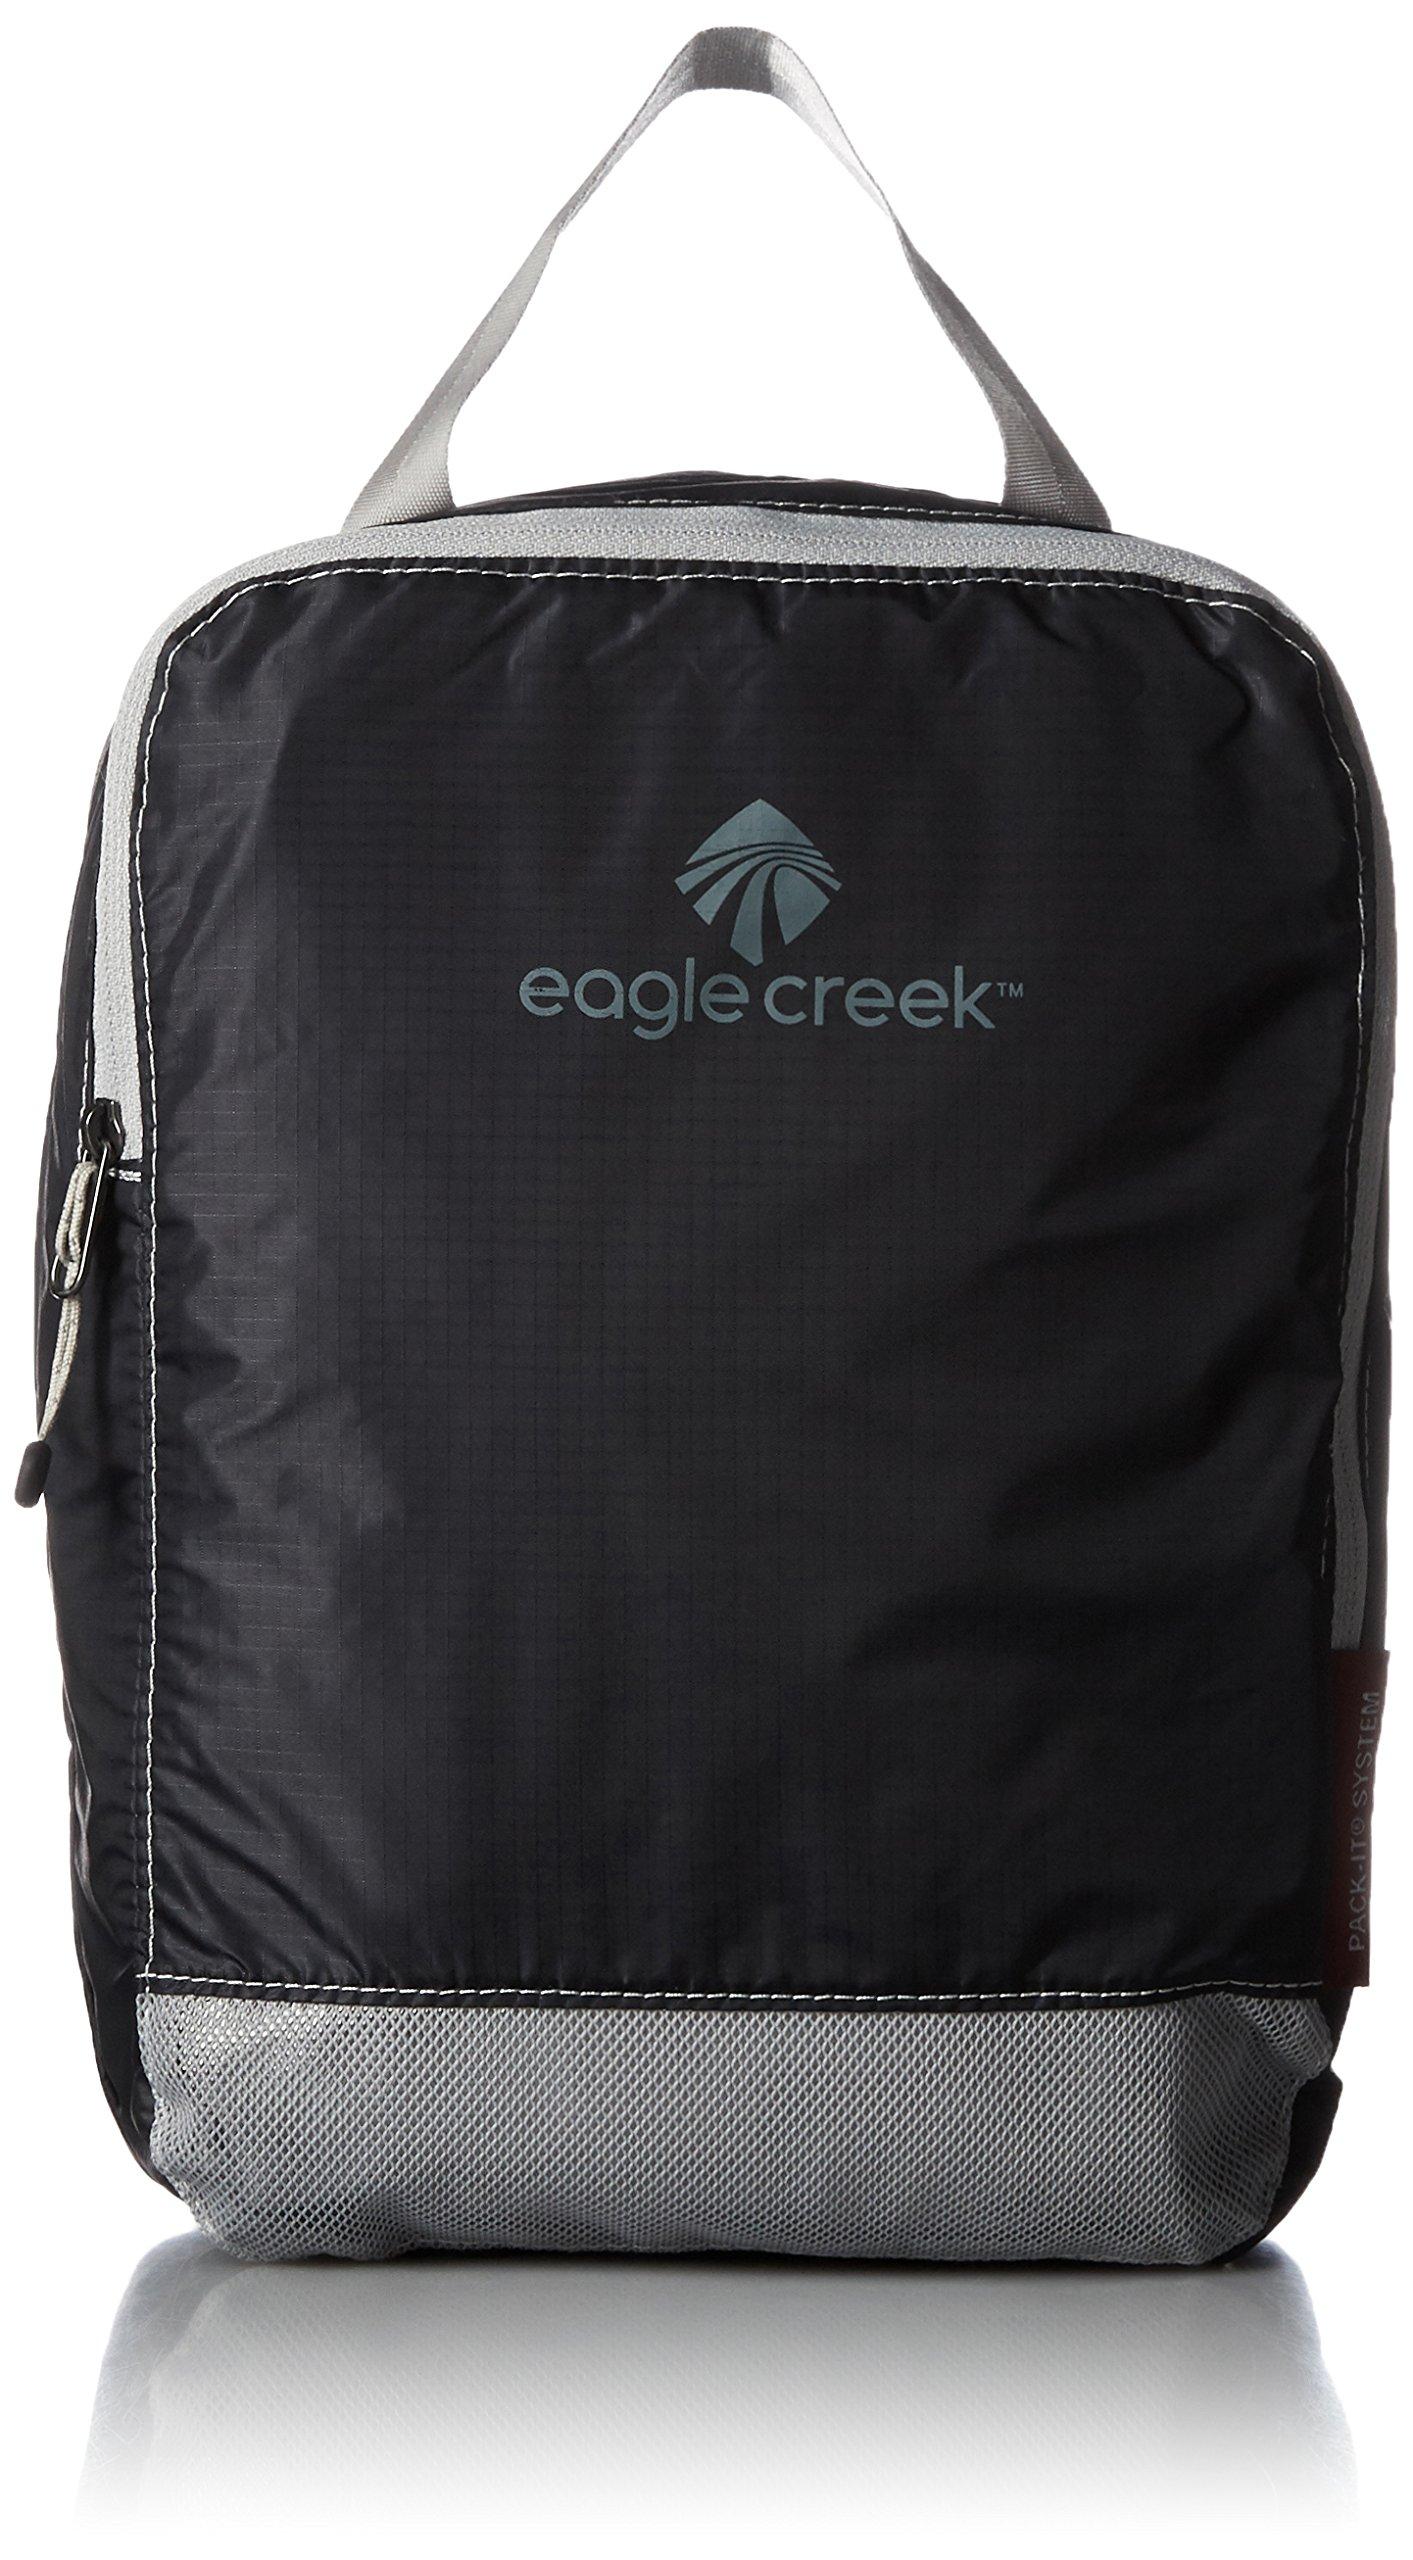 Eagle Creek Pack-it Specter Clean Dirty Half Cube, Ebony